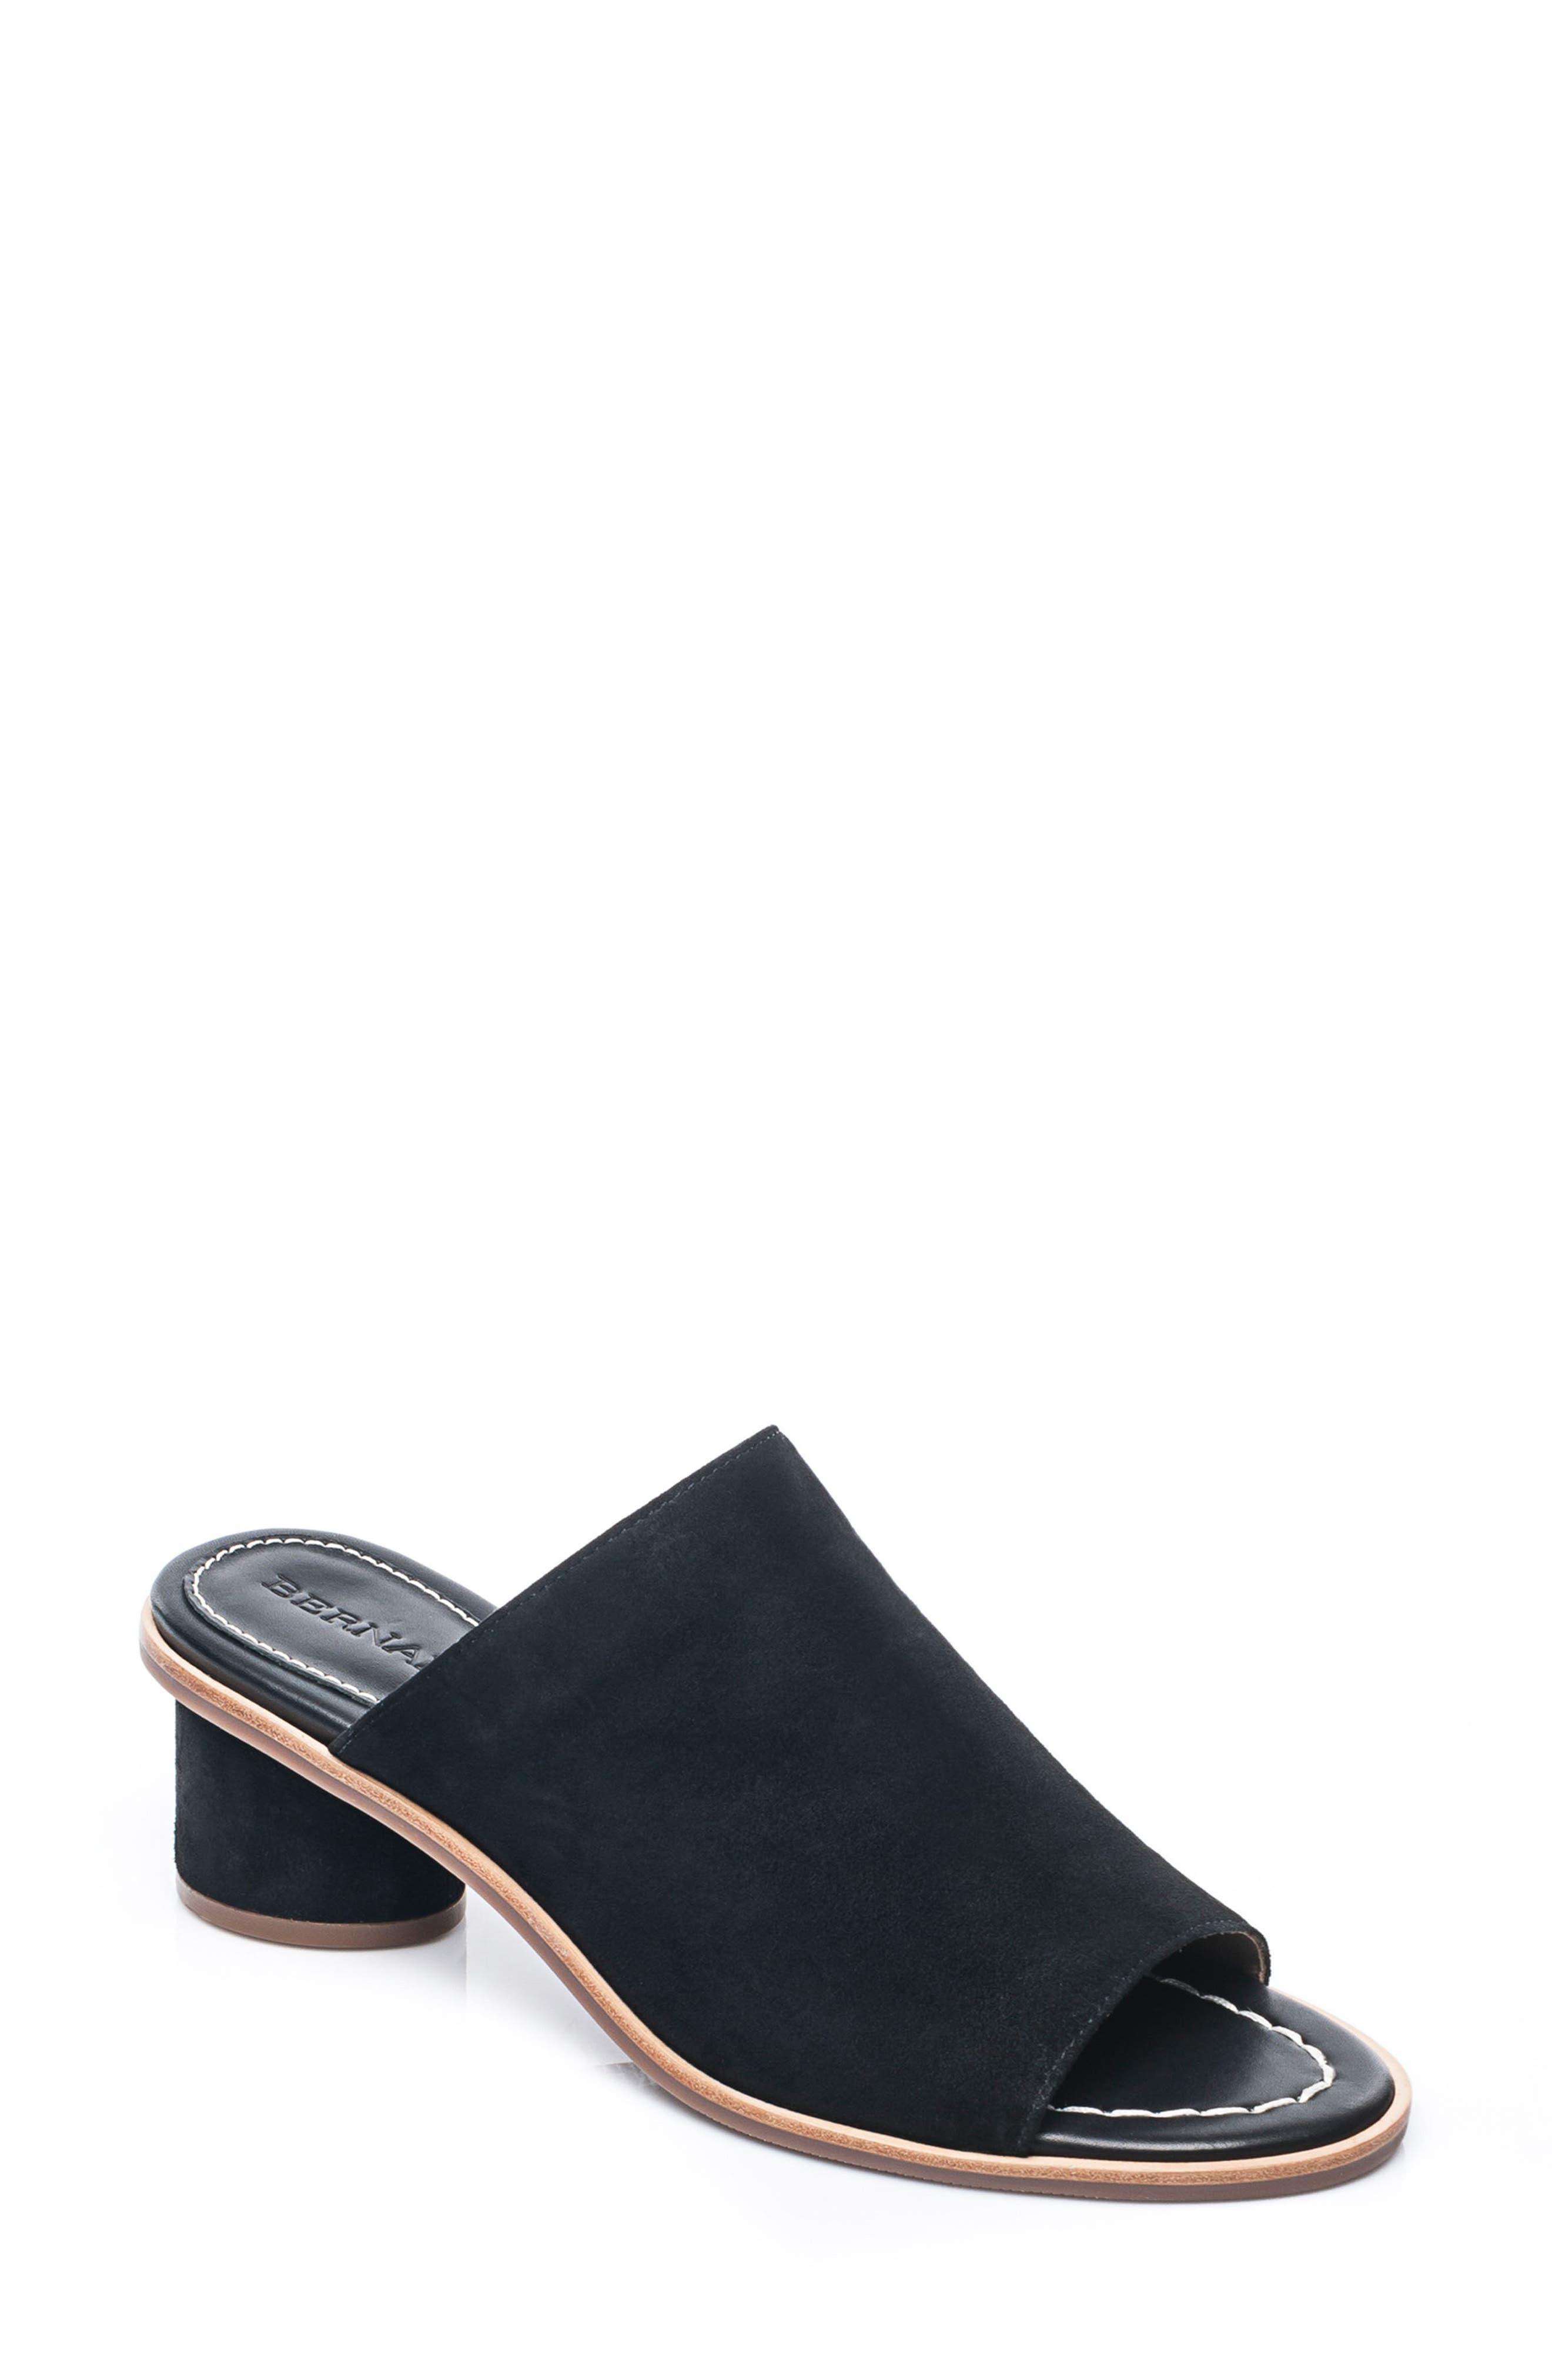 Bernardo Laurel Slide Sandal,                         Main,                         color, 001